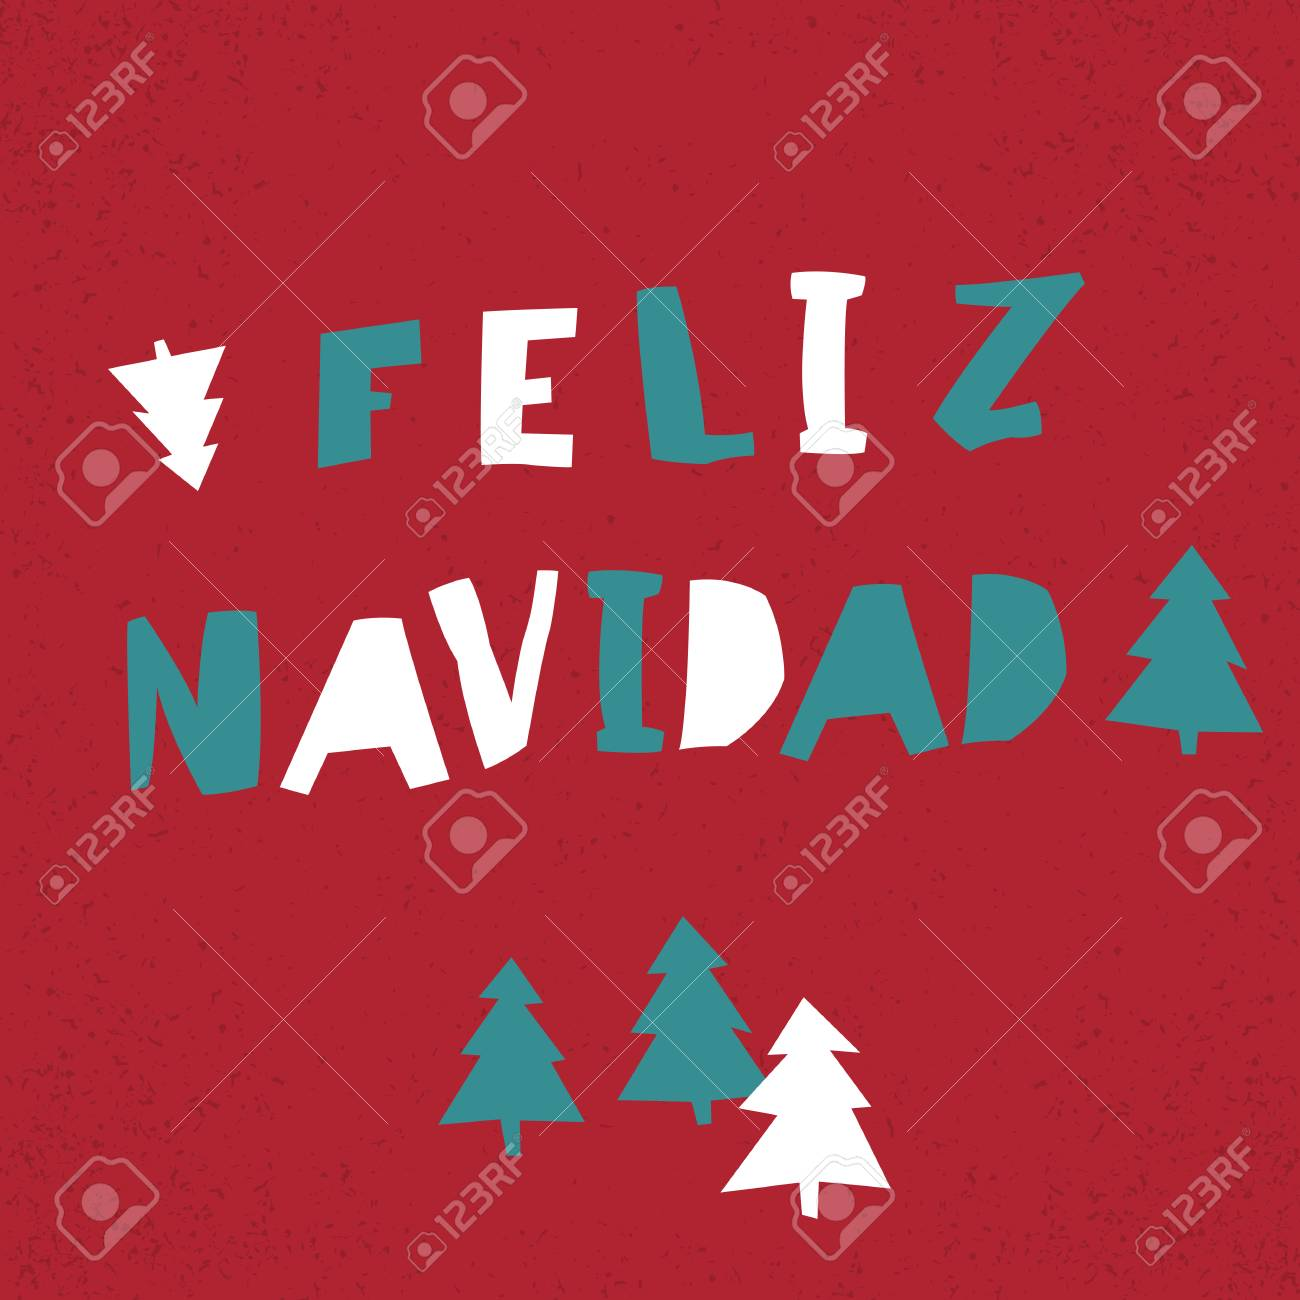 Feliz navidad vector merry christmas card template in spanish vector merry christmas card template in spanish language stock vector 67432654 kristyandbryce Images